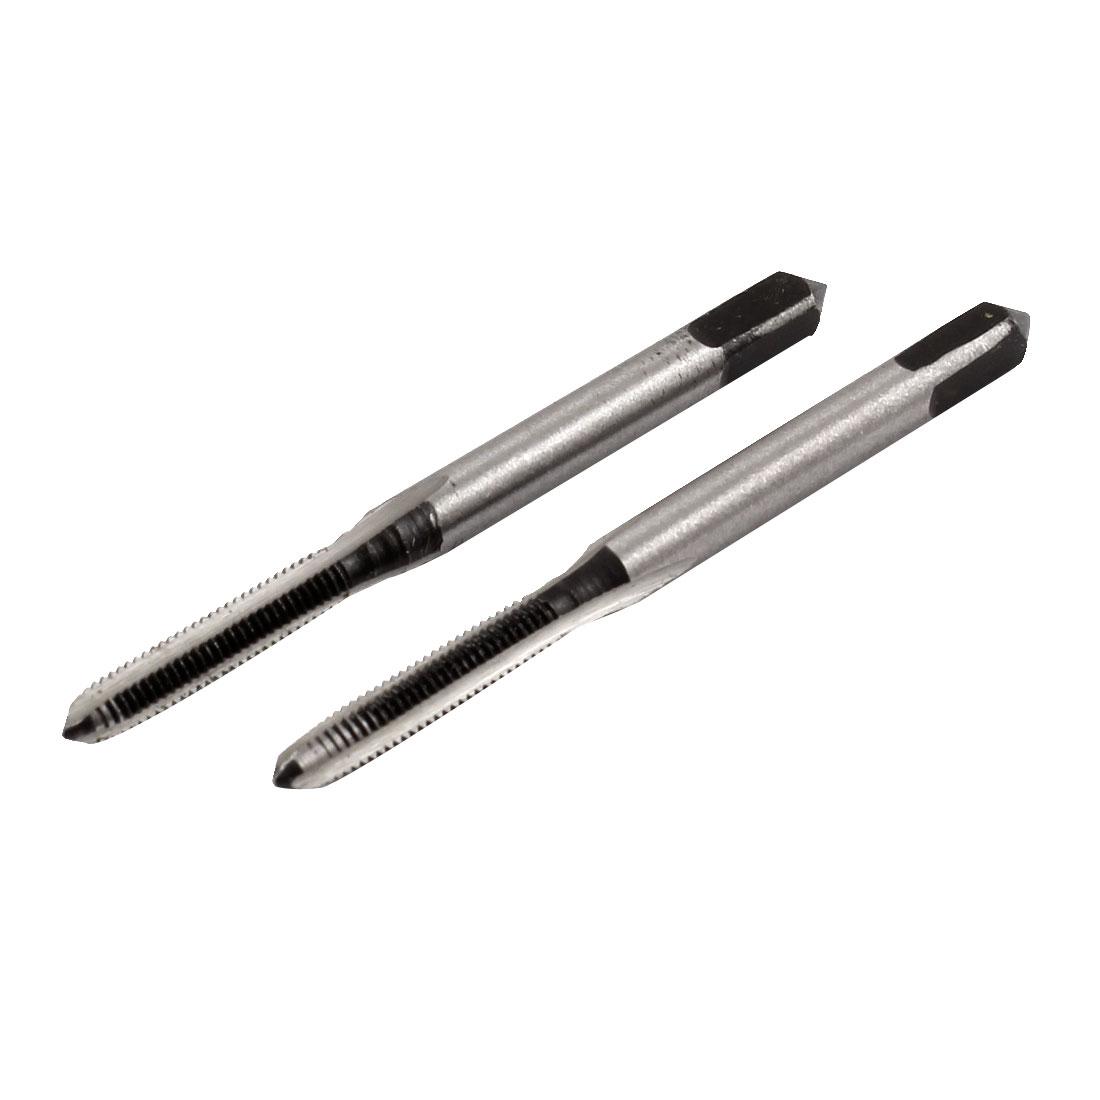 HSS 3 Flute 3mm x 0.5mm Taper and Metric Tap M3 x 0.5mm Pitch 2 Pcs